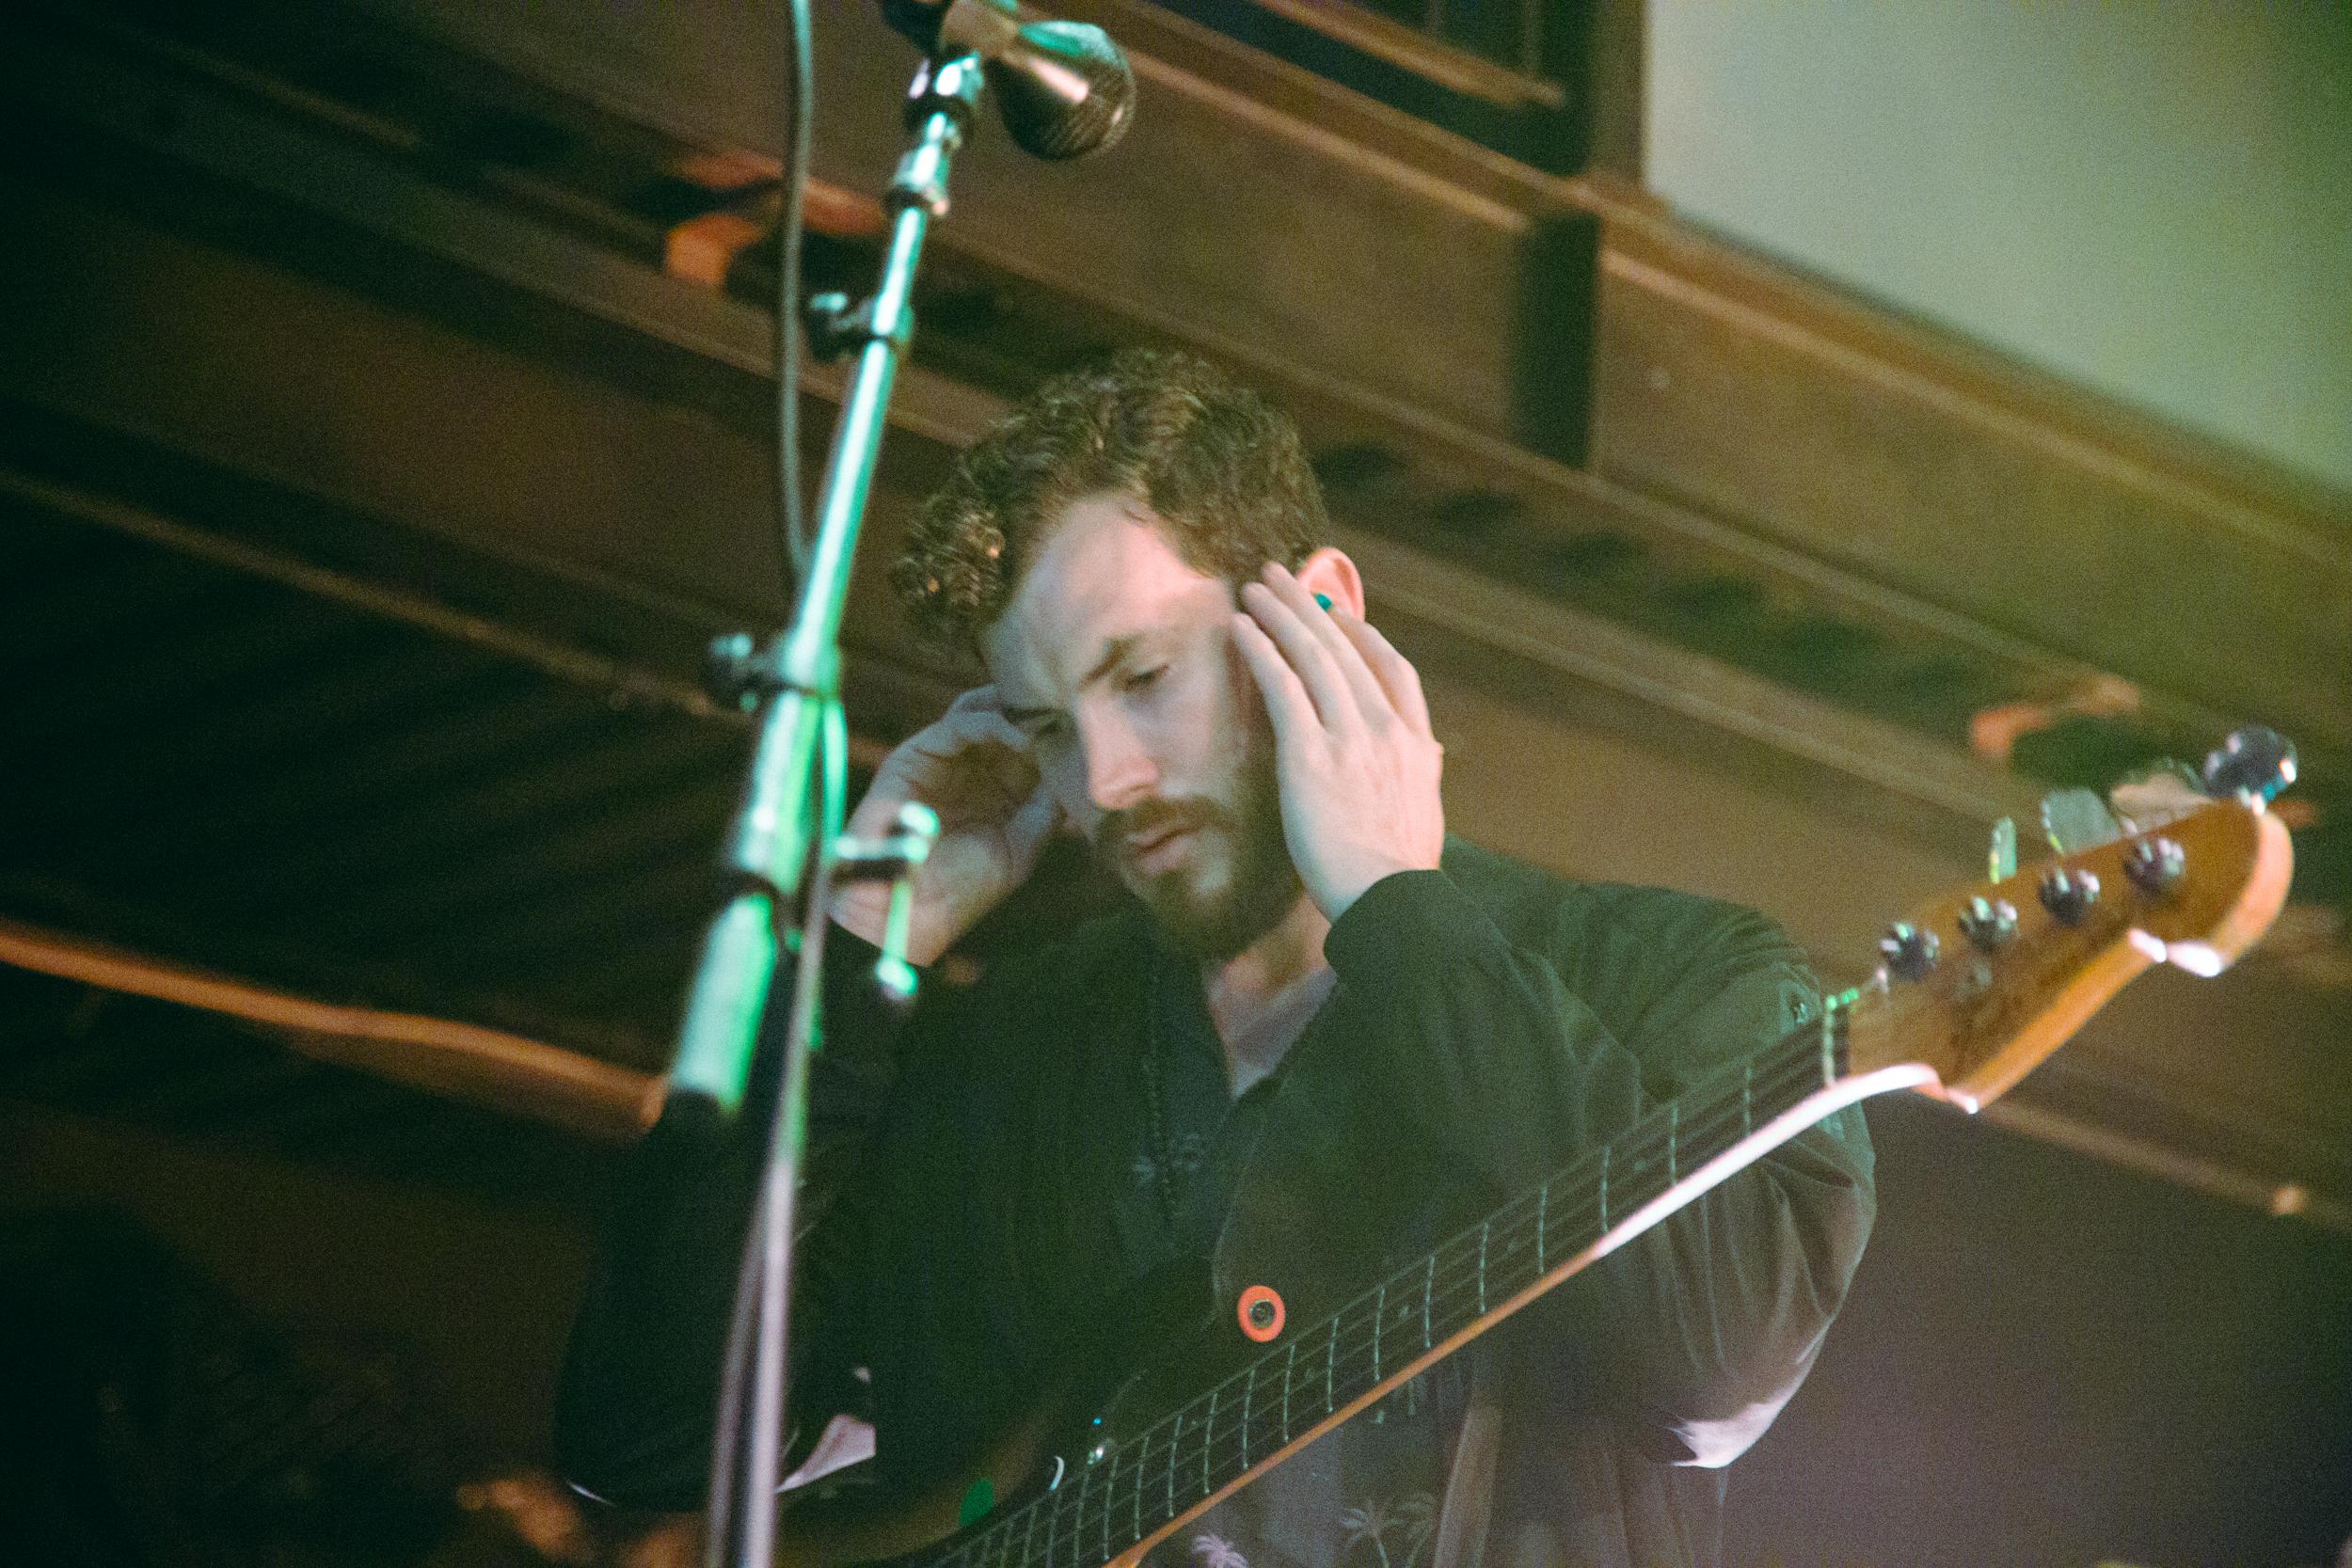 Nick Murphy at 9:30 Club (Photo by Carolina Correa-Caro)